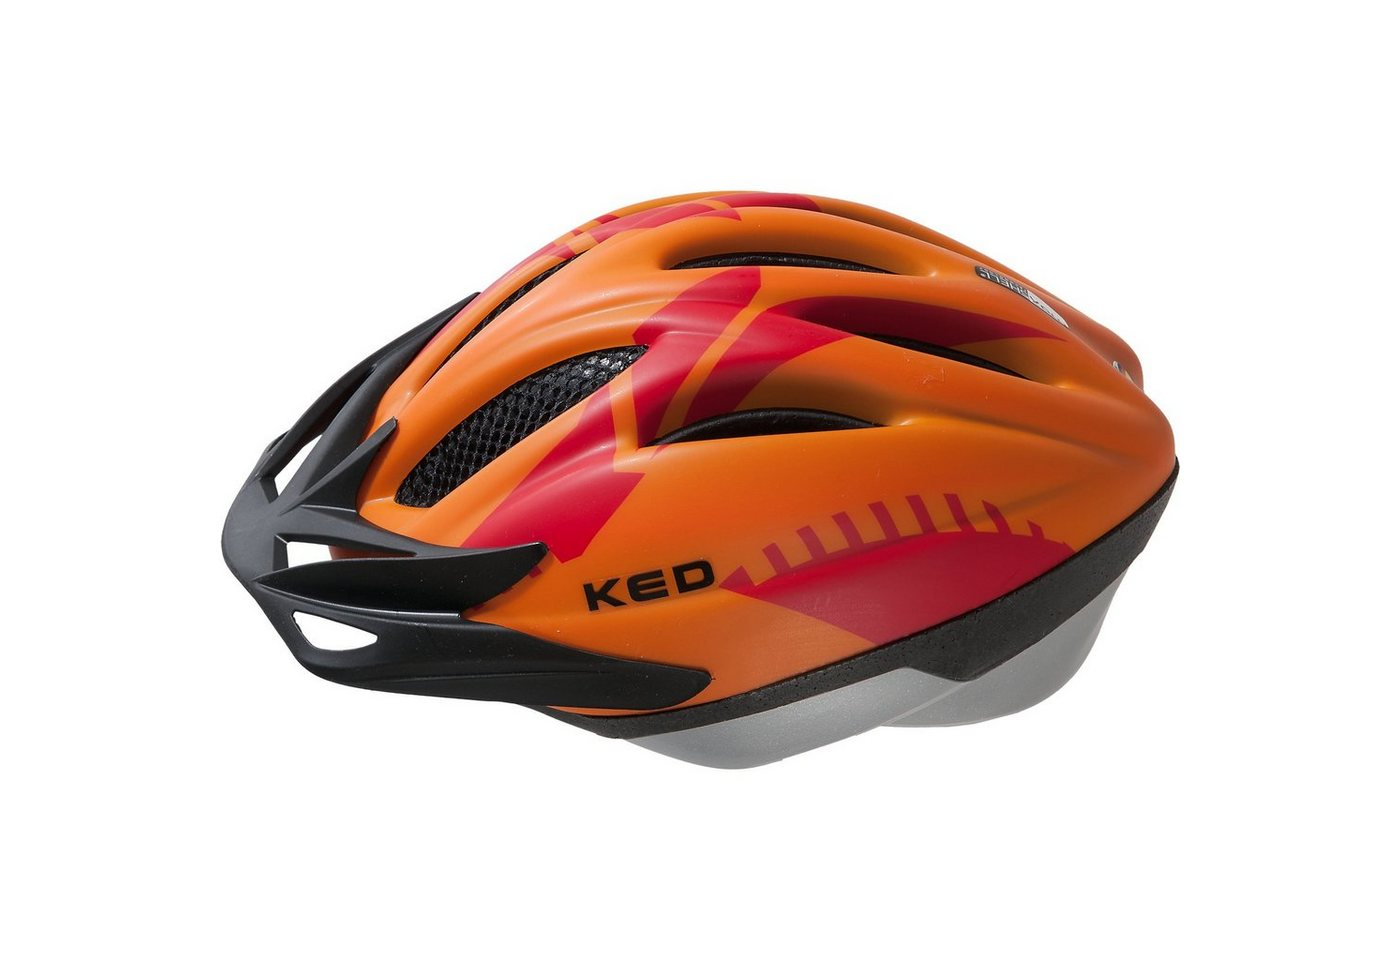 ked helmsysteme fahrradhelm joker orange. Black Bedroom Furniture Sets. Home Design Ideas